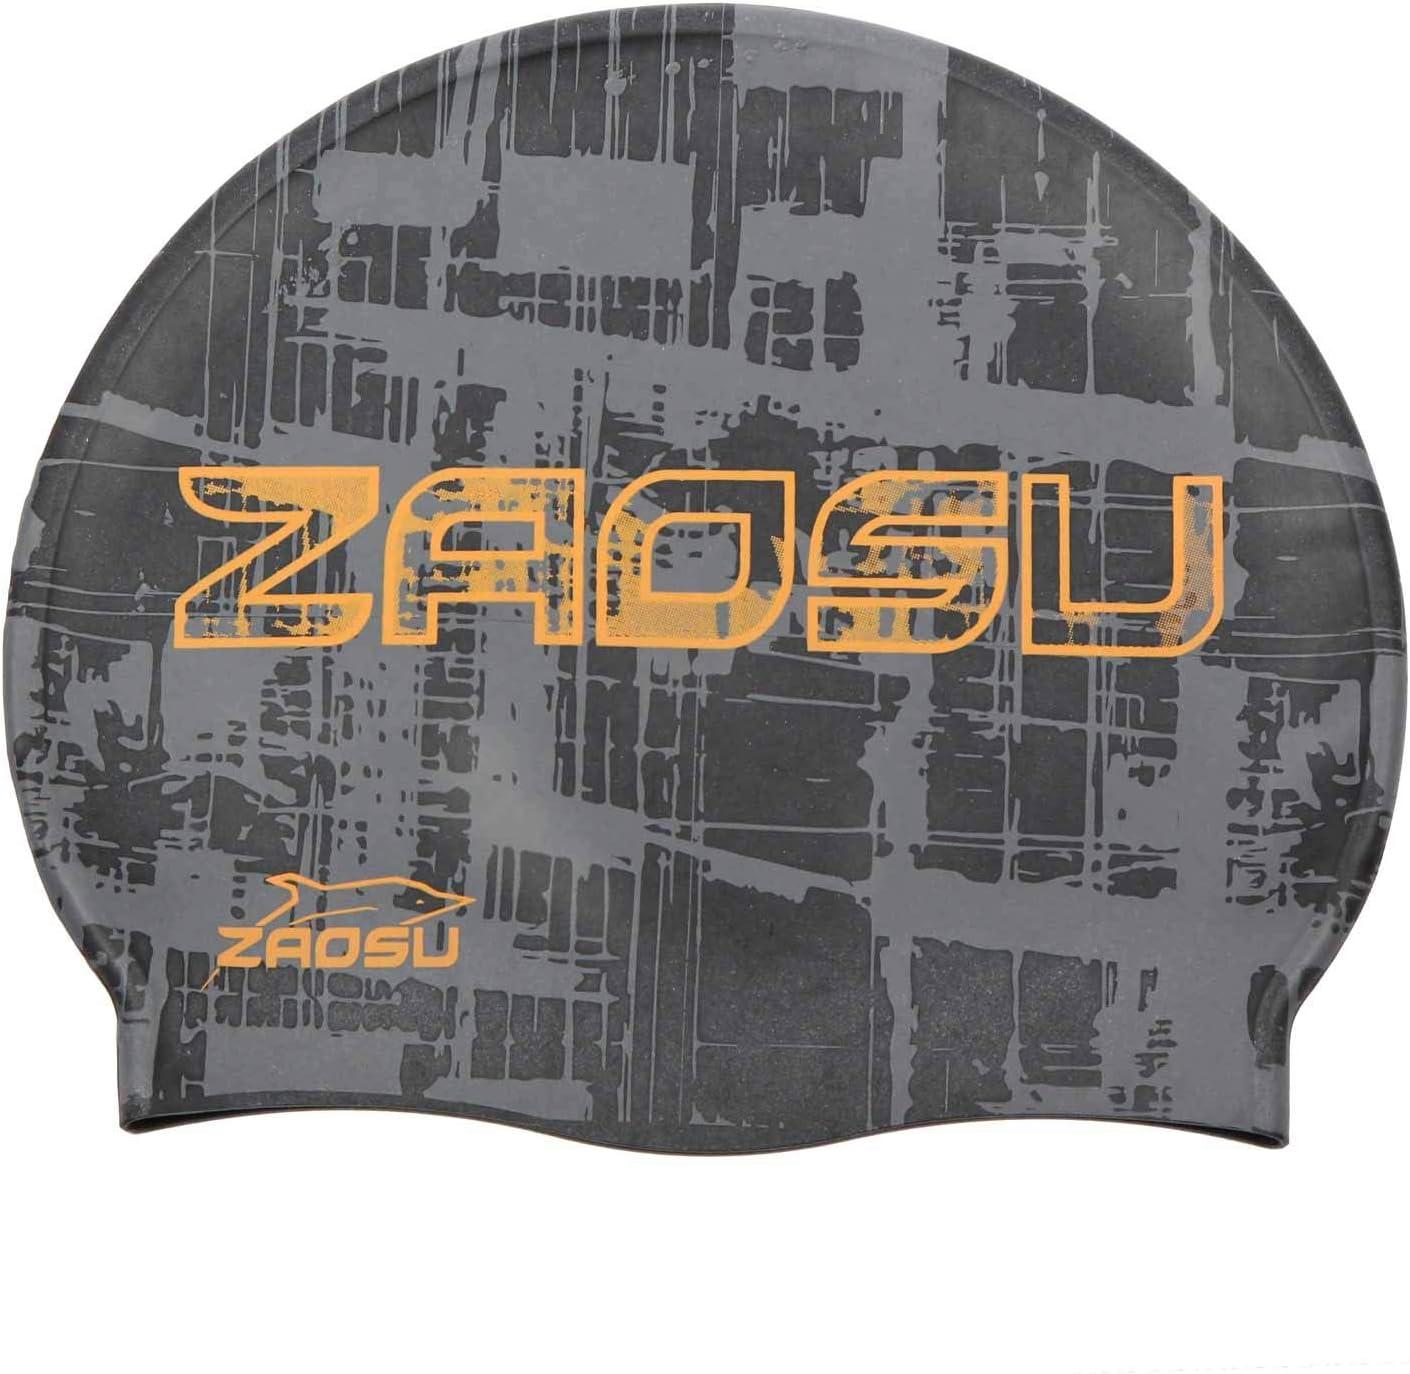 Impermeable ZAOSU Modelo 2014 1002